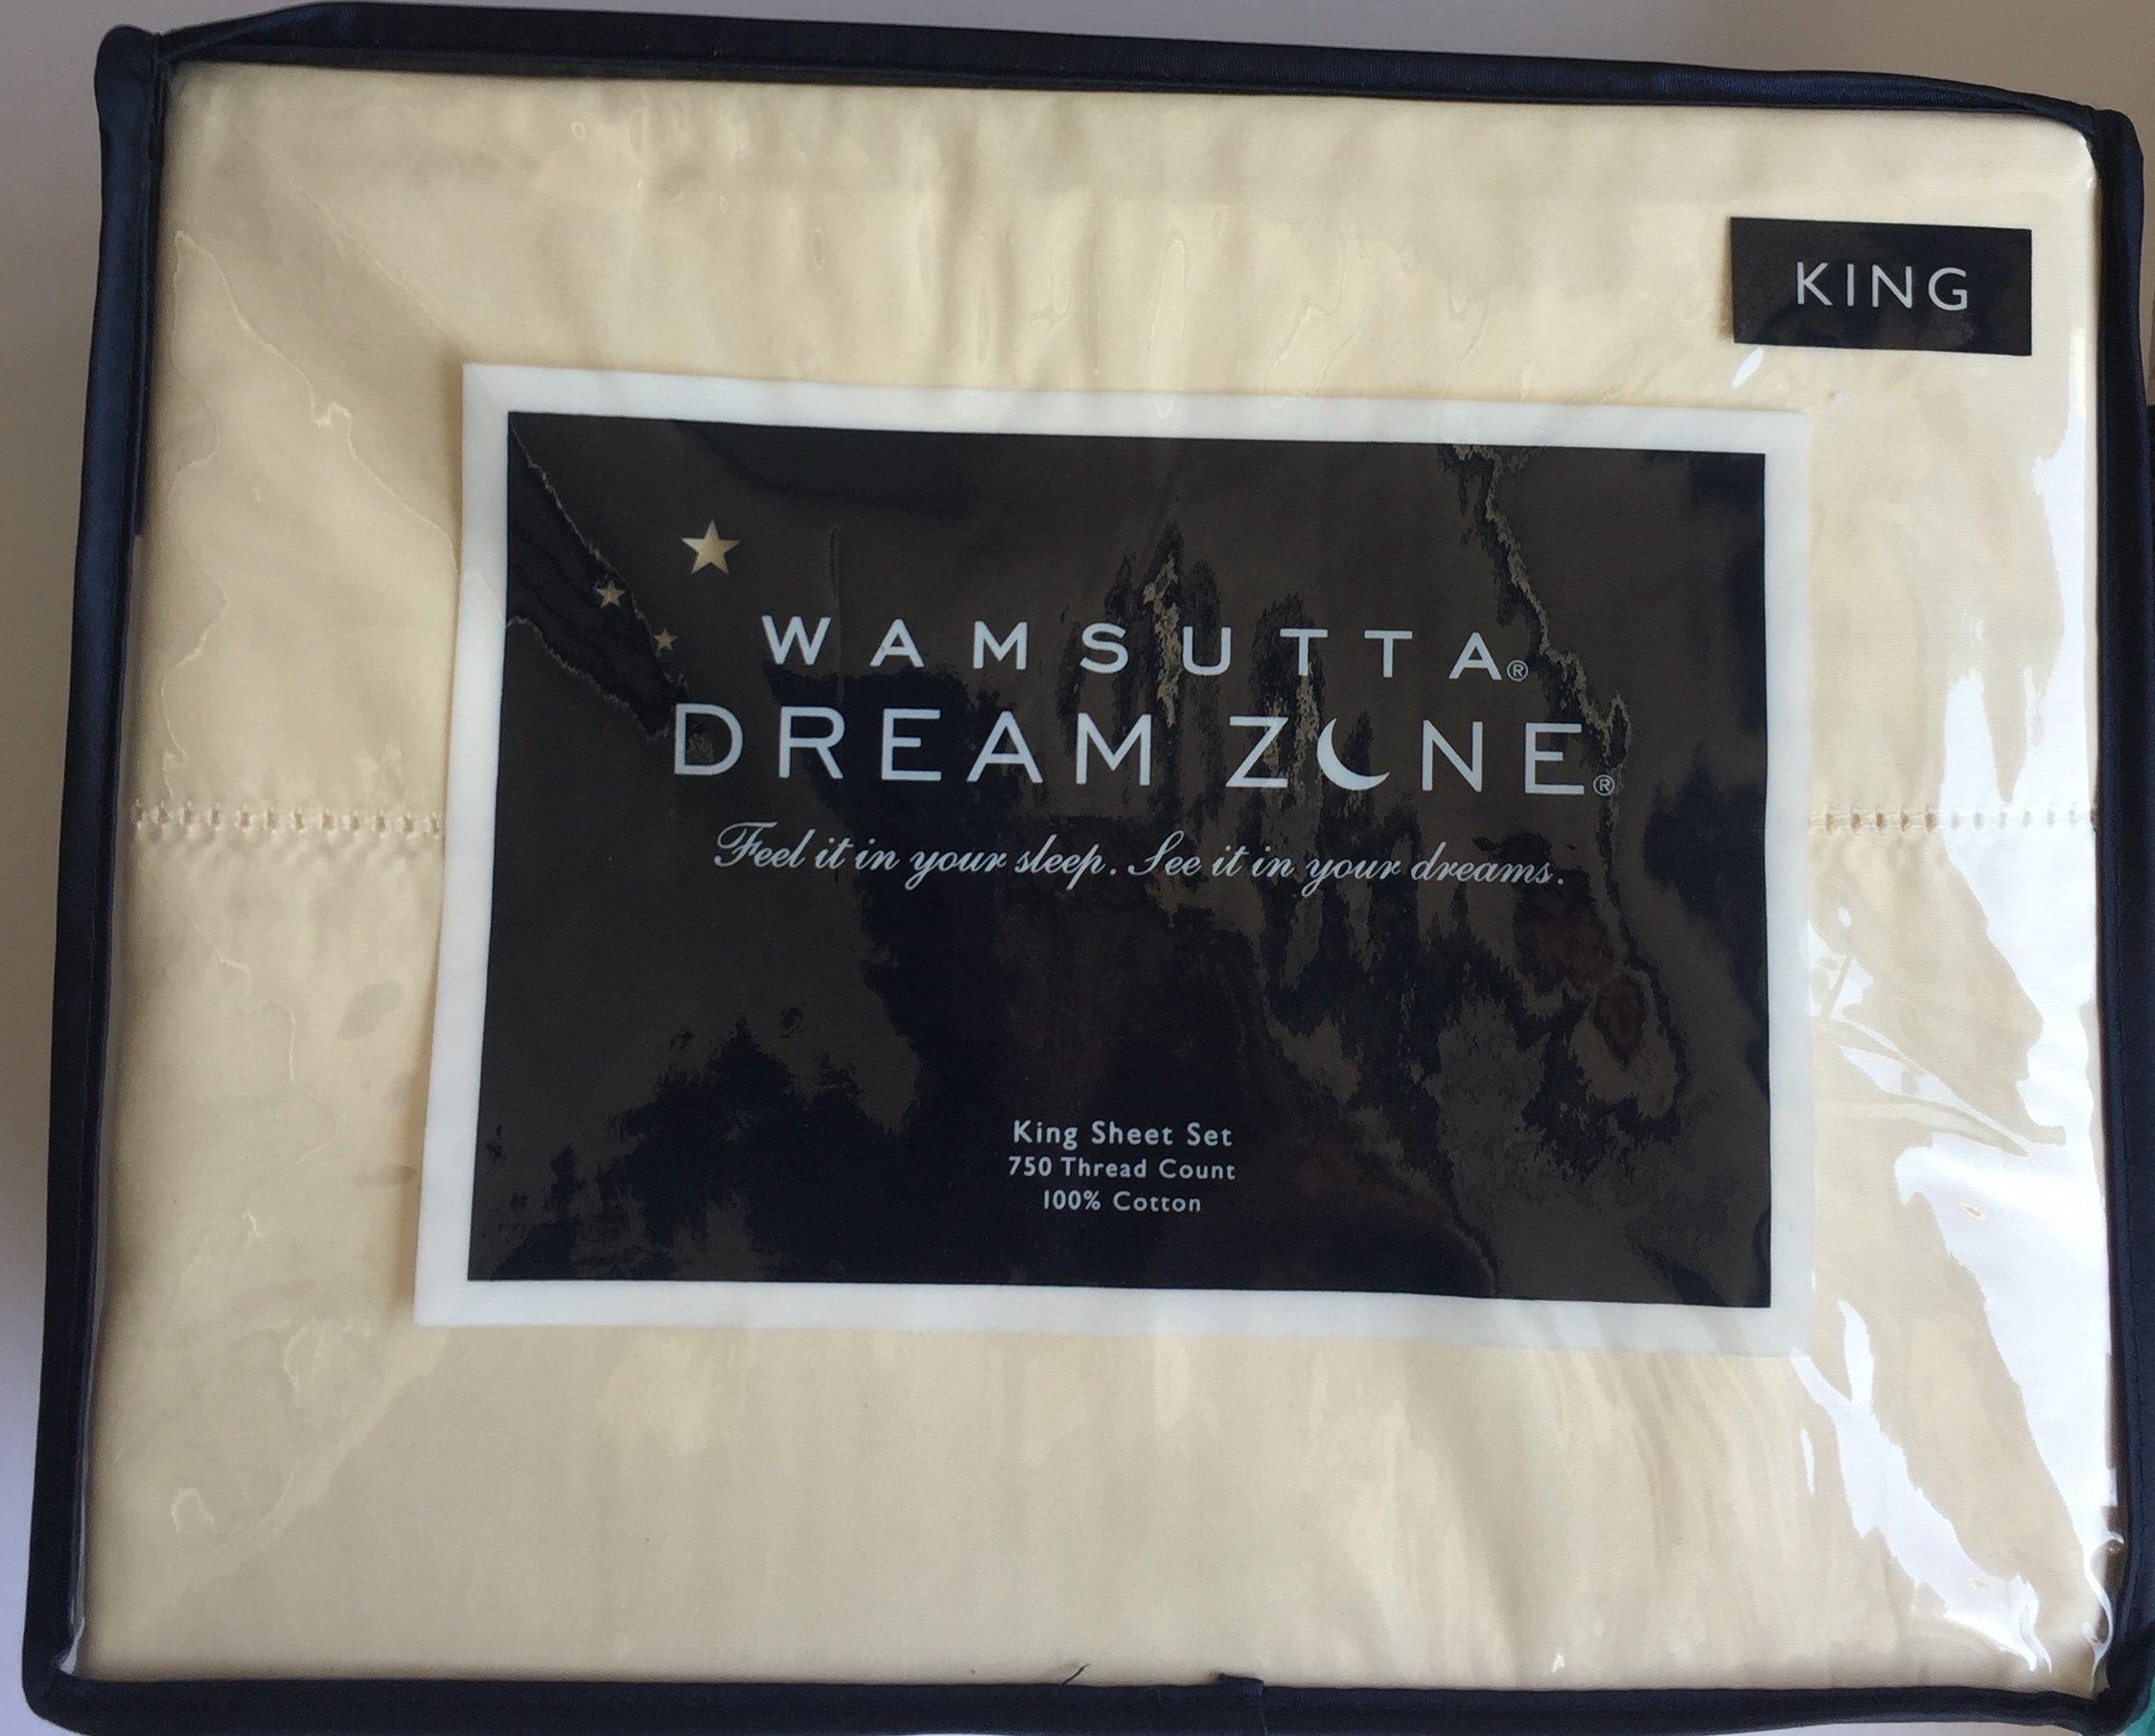 Wamsutta Dream Zone King Sheet Set, Ivory Cream, 750 Thread Count by Wamsutta